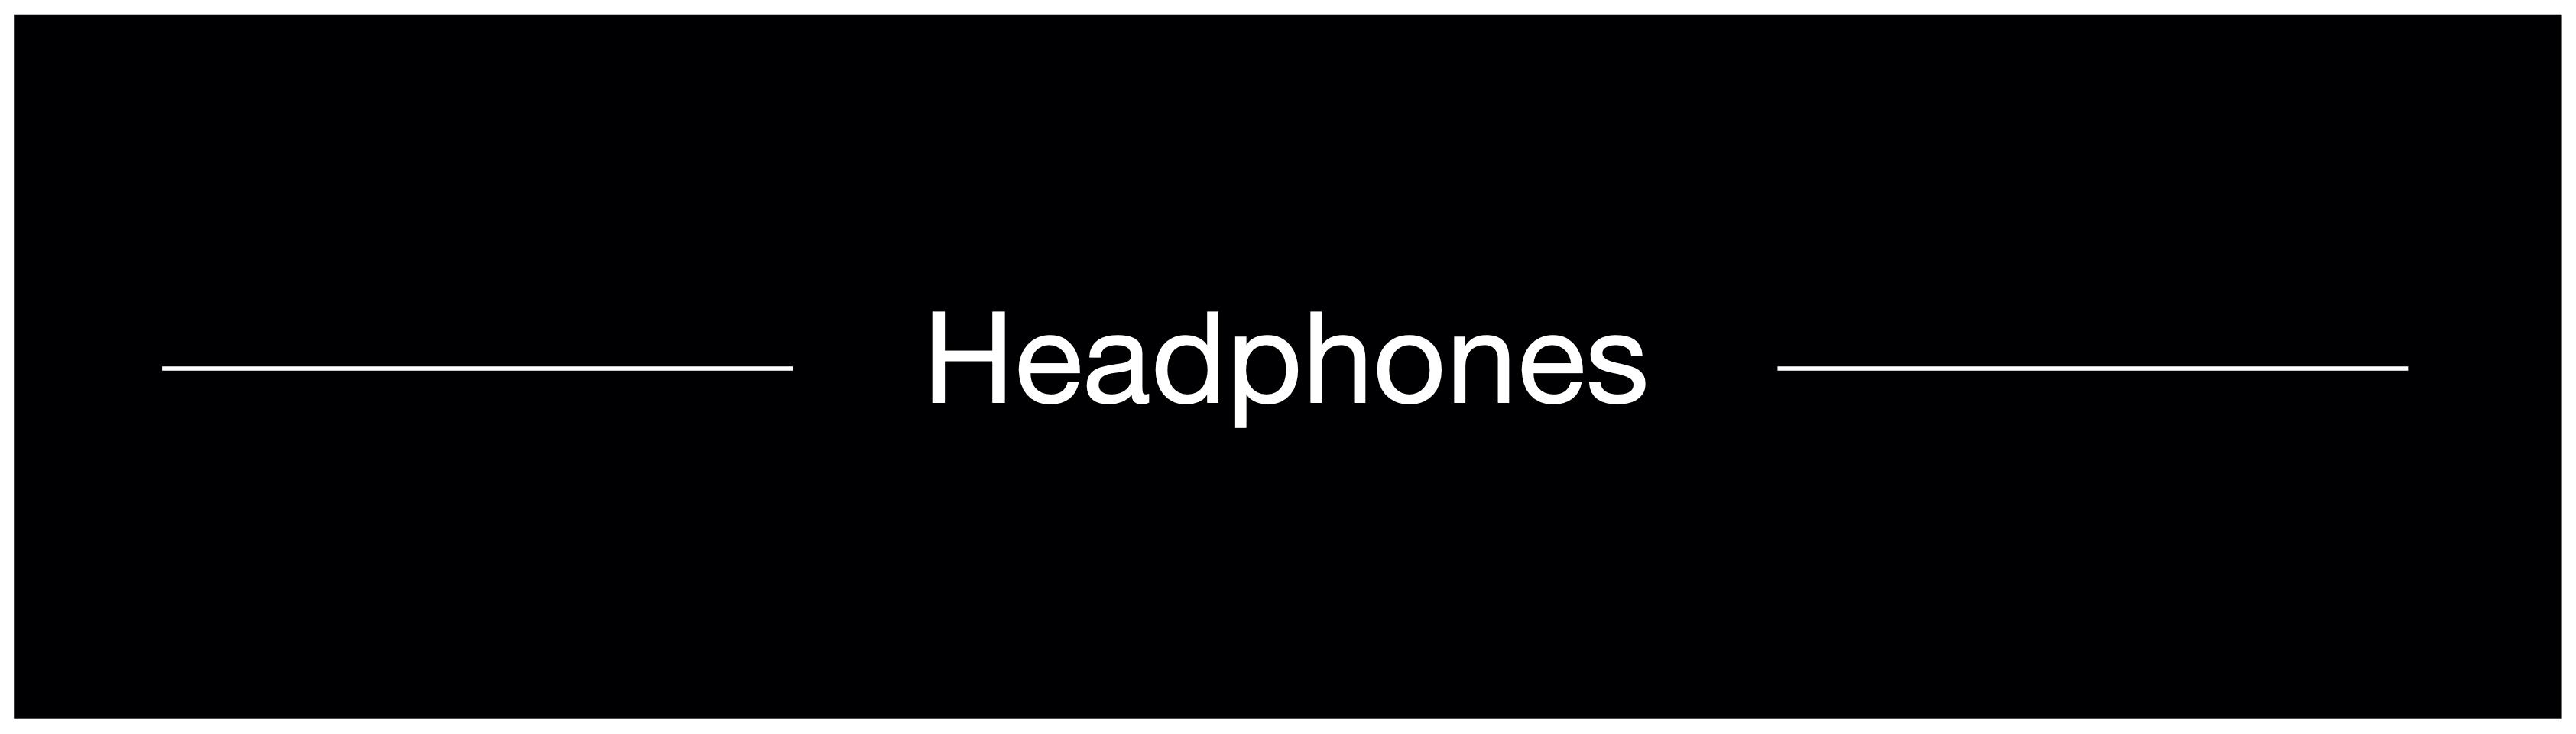 headphones-logo.jpg